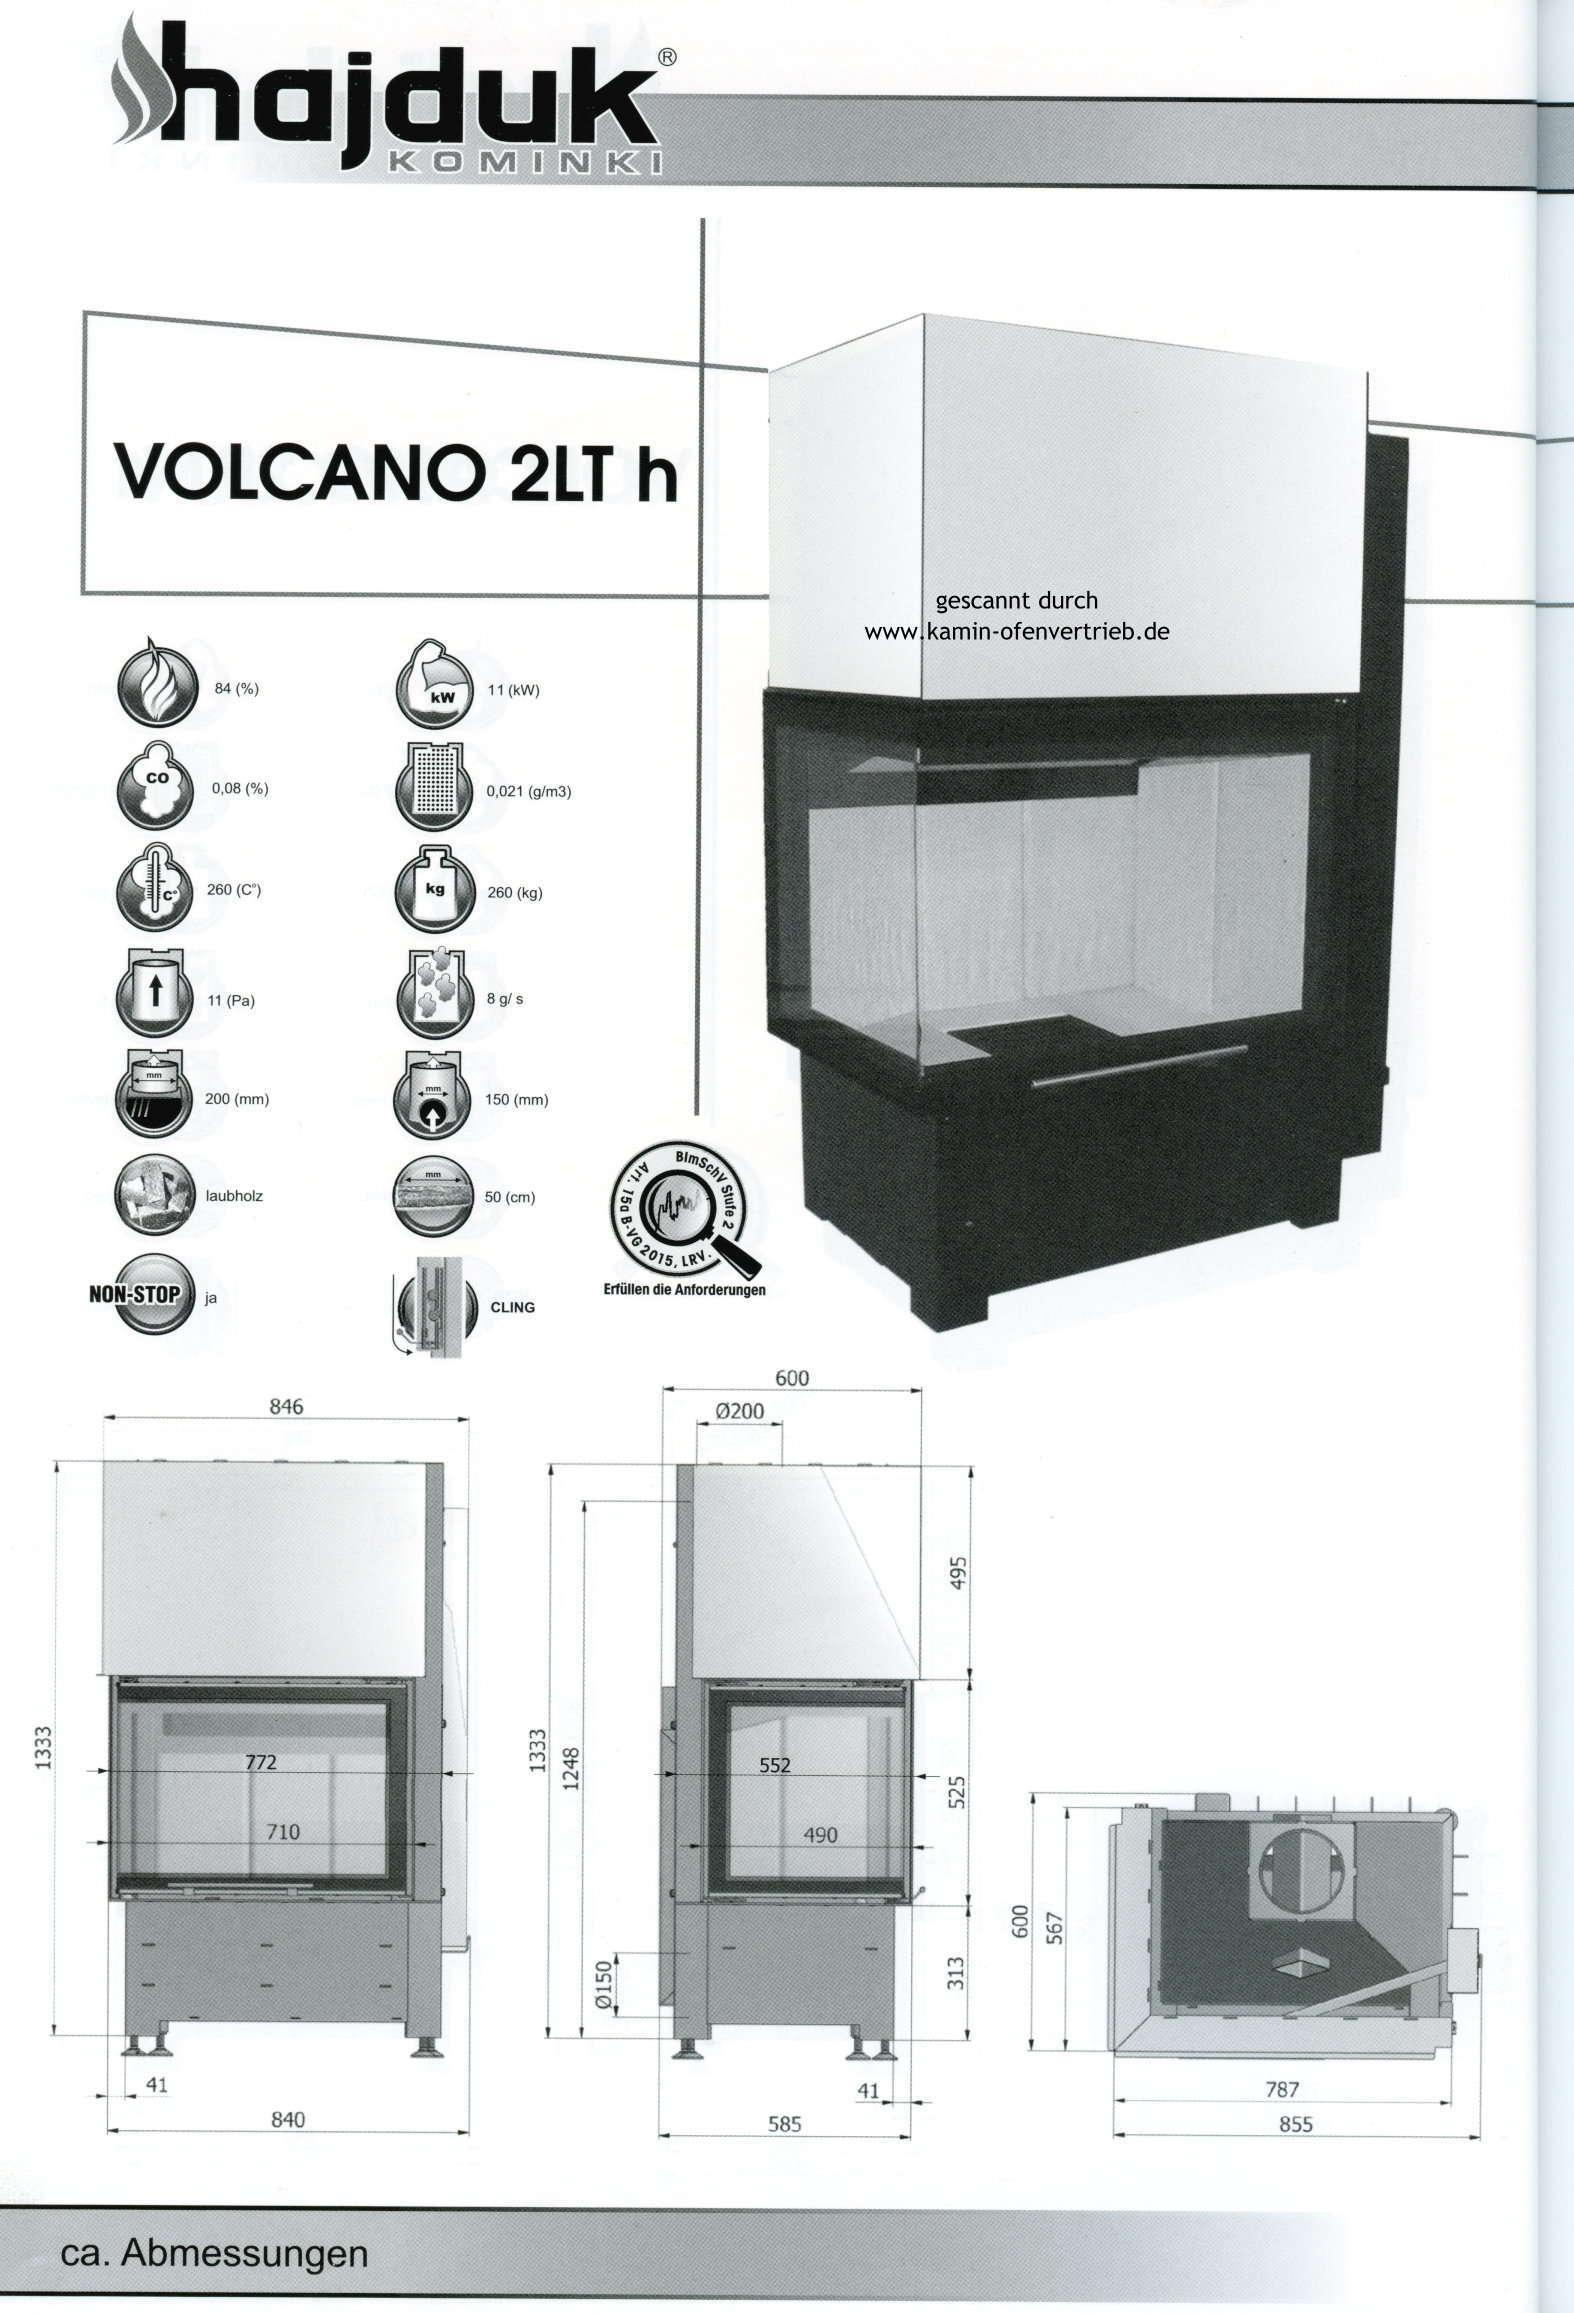 hajduk kamineinsatz volcano 1v h n h 2l 2p h t fd h 3plh. Black Bedroom Furniture Sets. Home Design Ideas